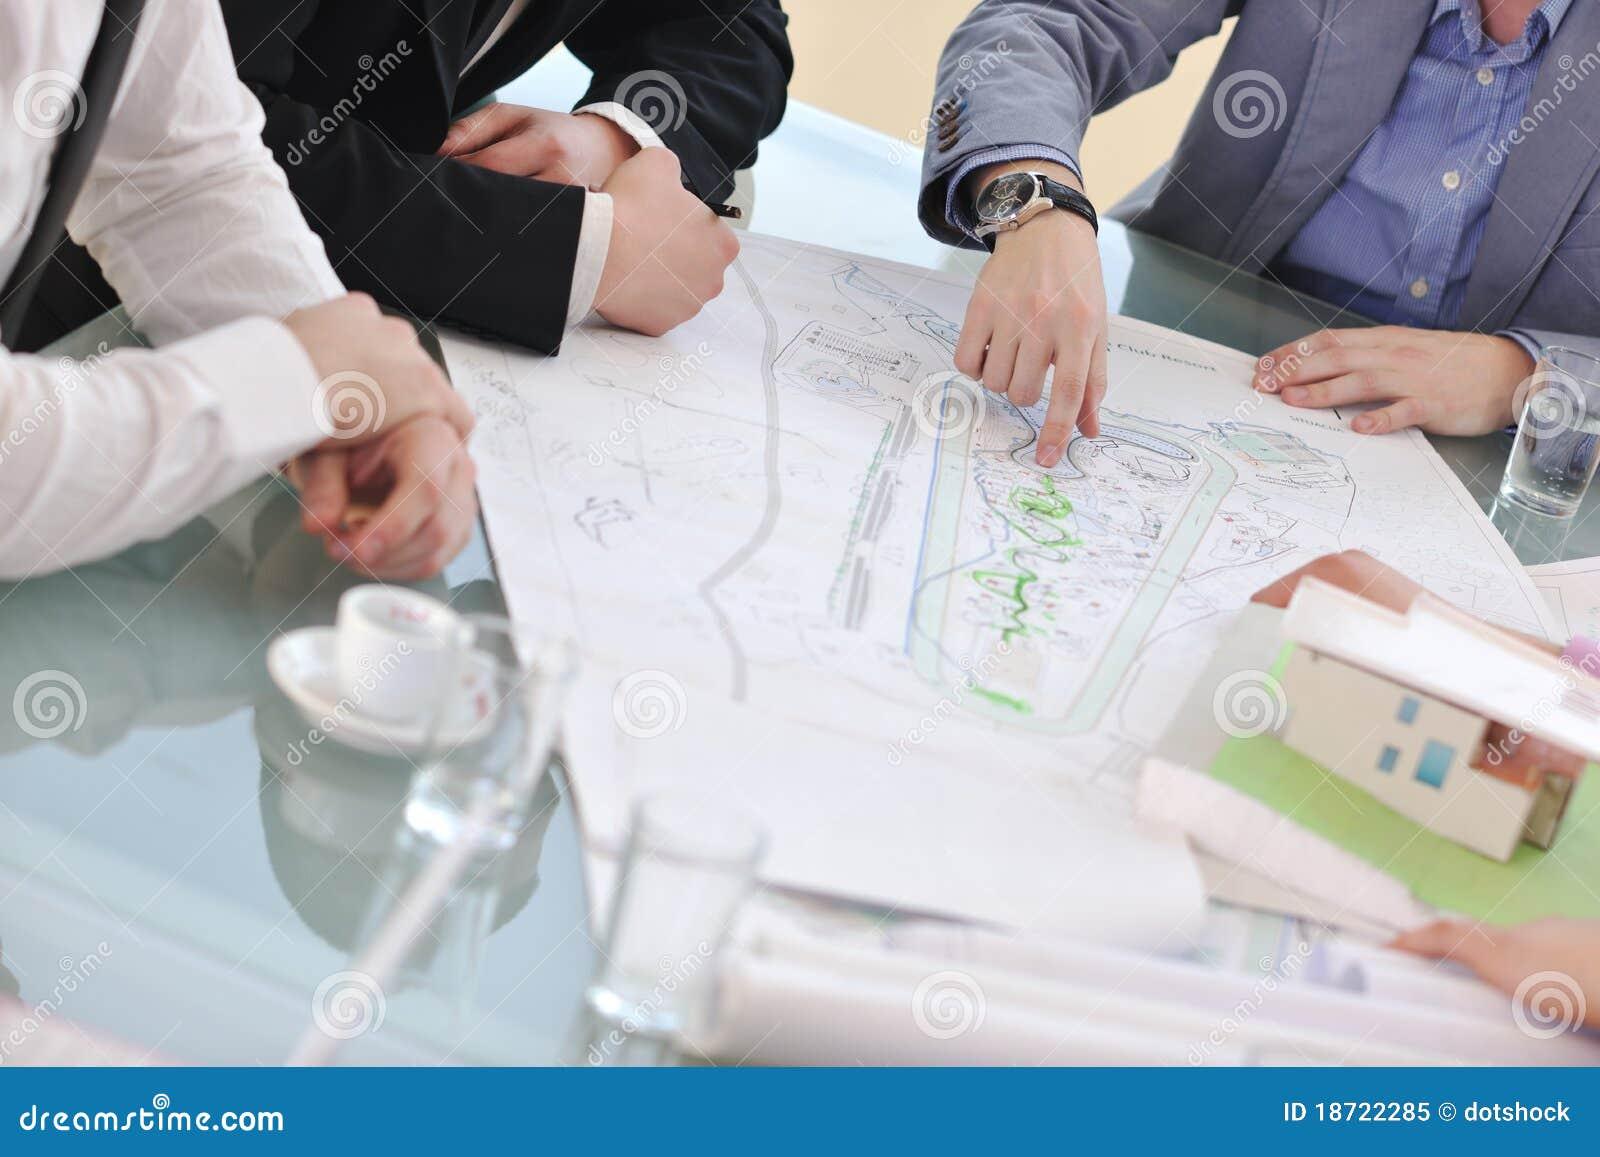 Команда дела архитектора на встрече